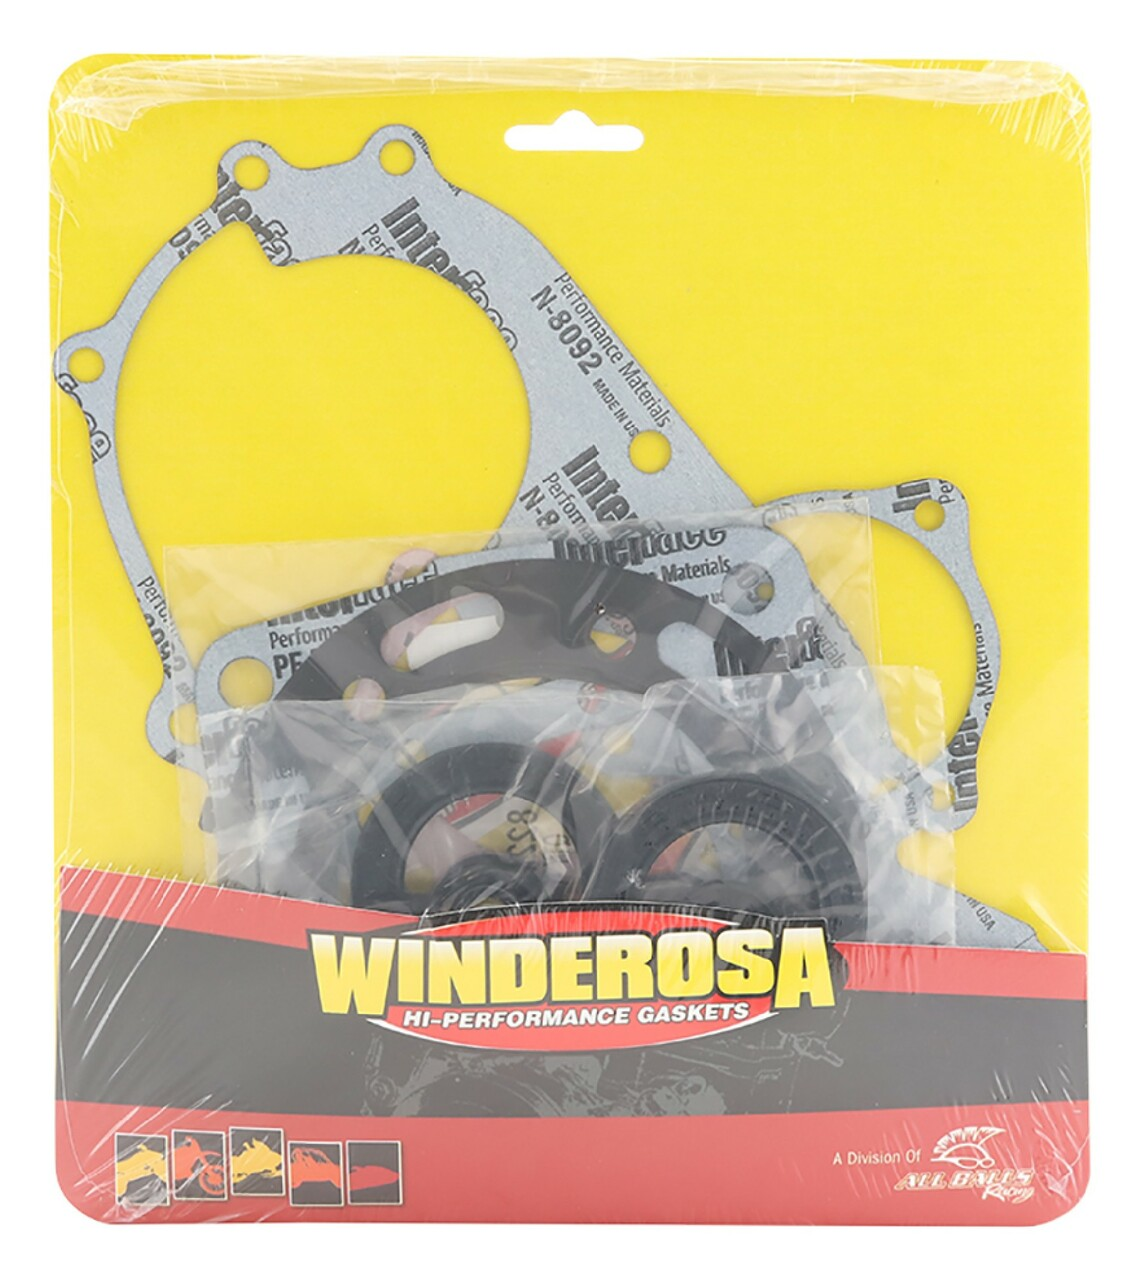 Gasket Set with Oil Seals For 1996 Polaris Xplorer 400 4x4 ATV~Winderosa 811808